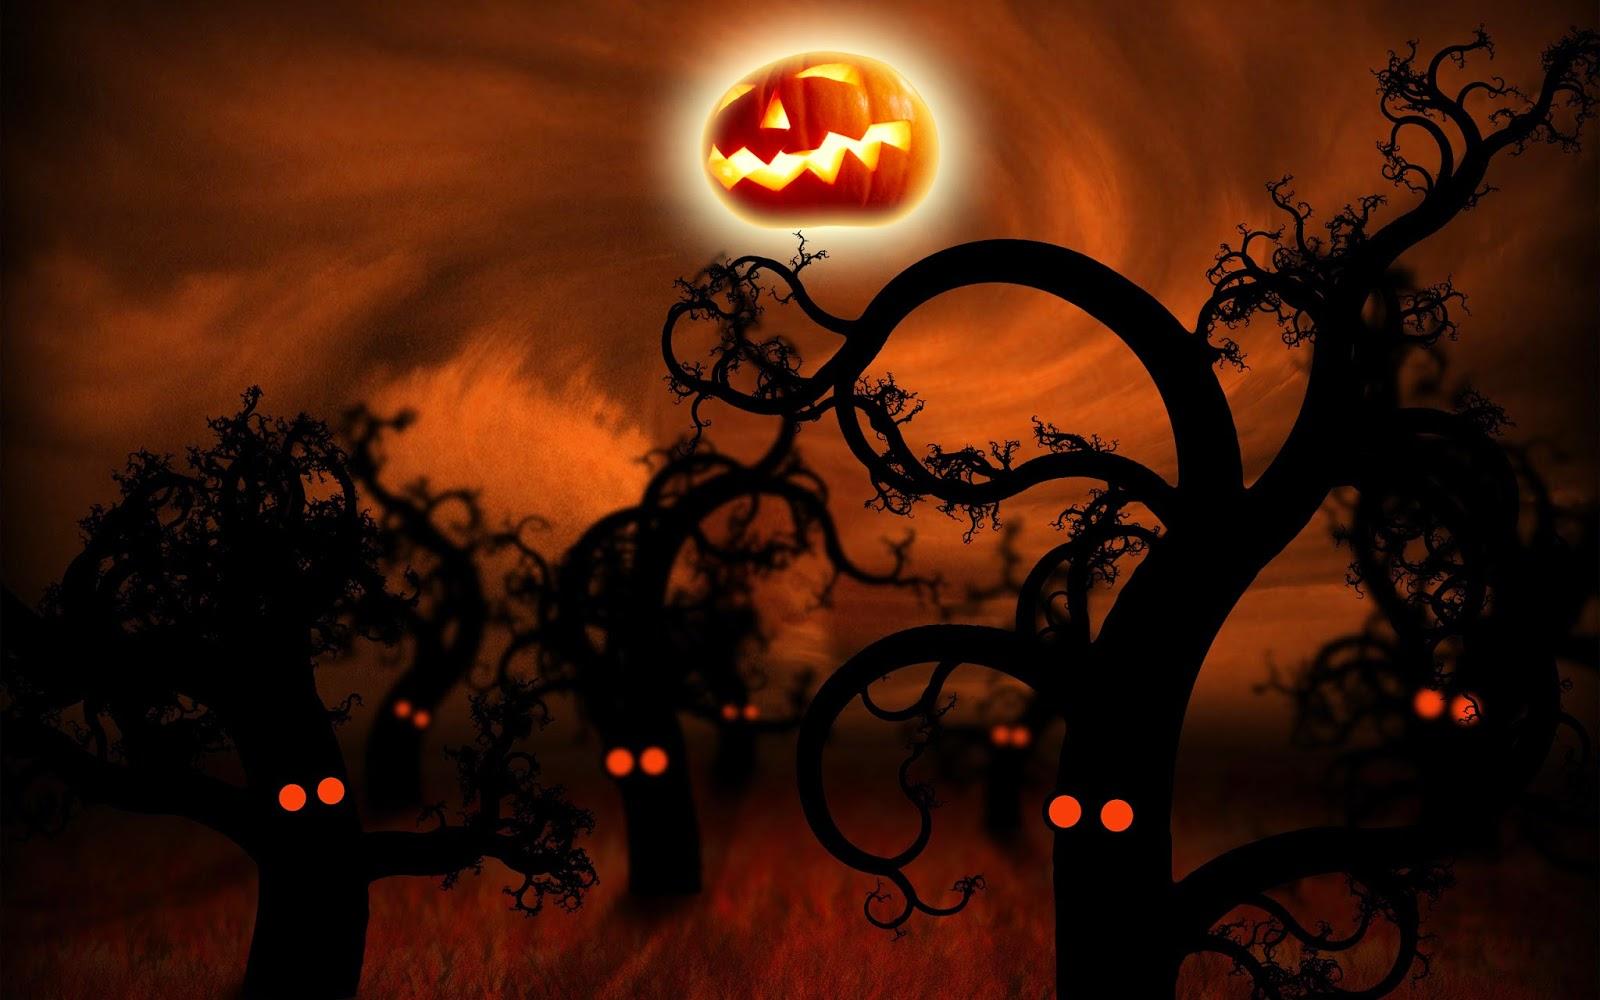 halloween wallpaper hd